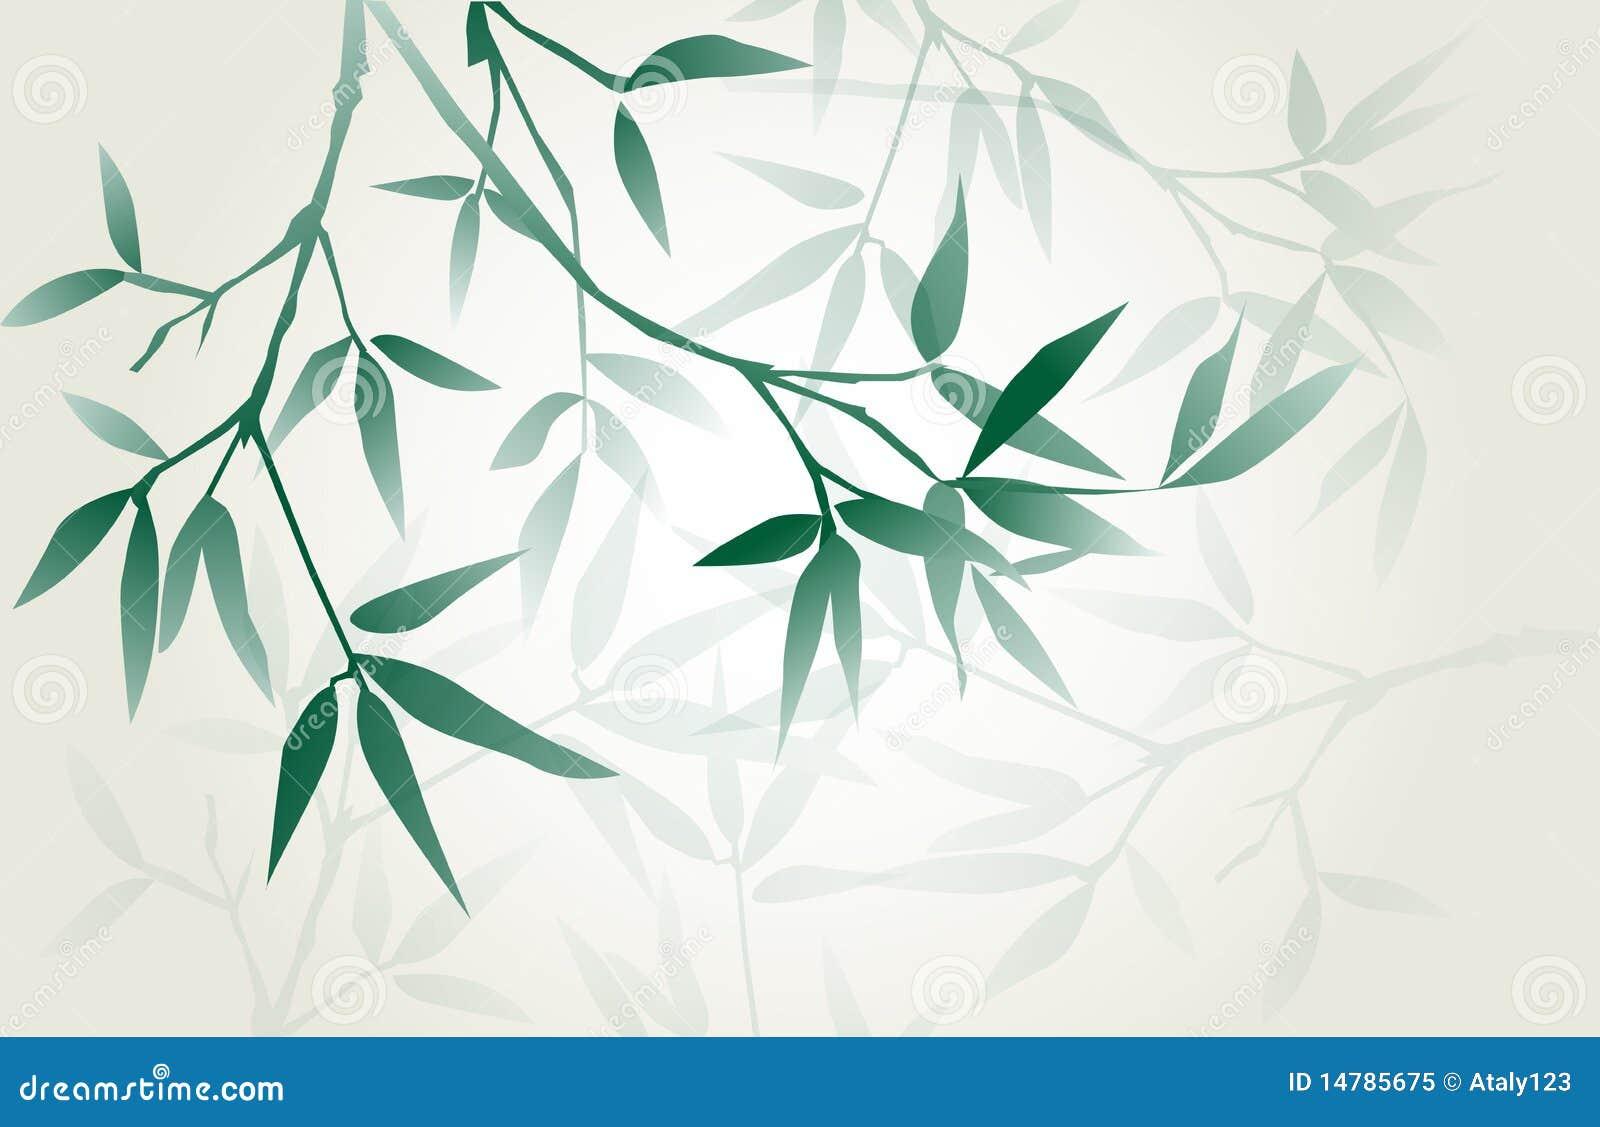 Japanese Calligraphy Bamboo Royalty Free Stock Photo